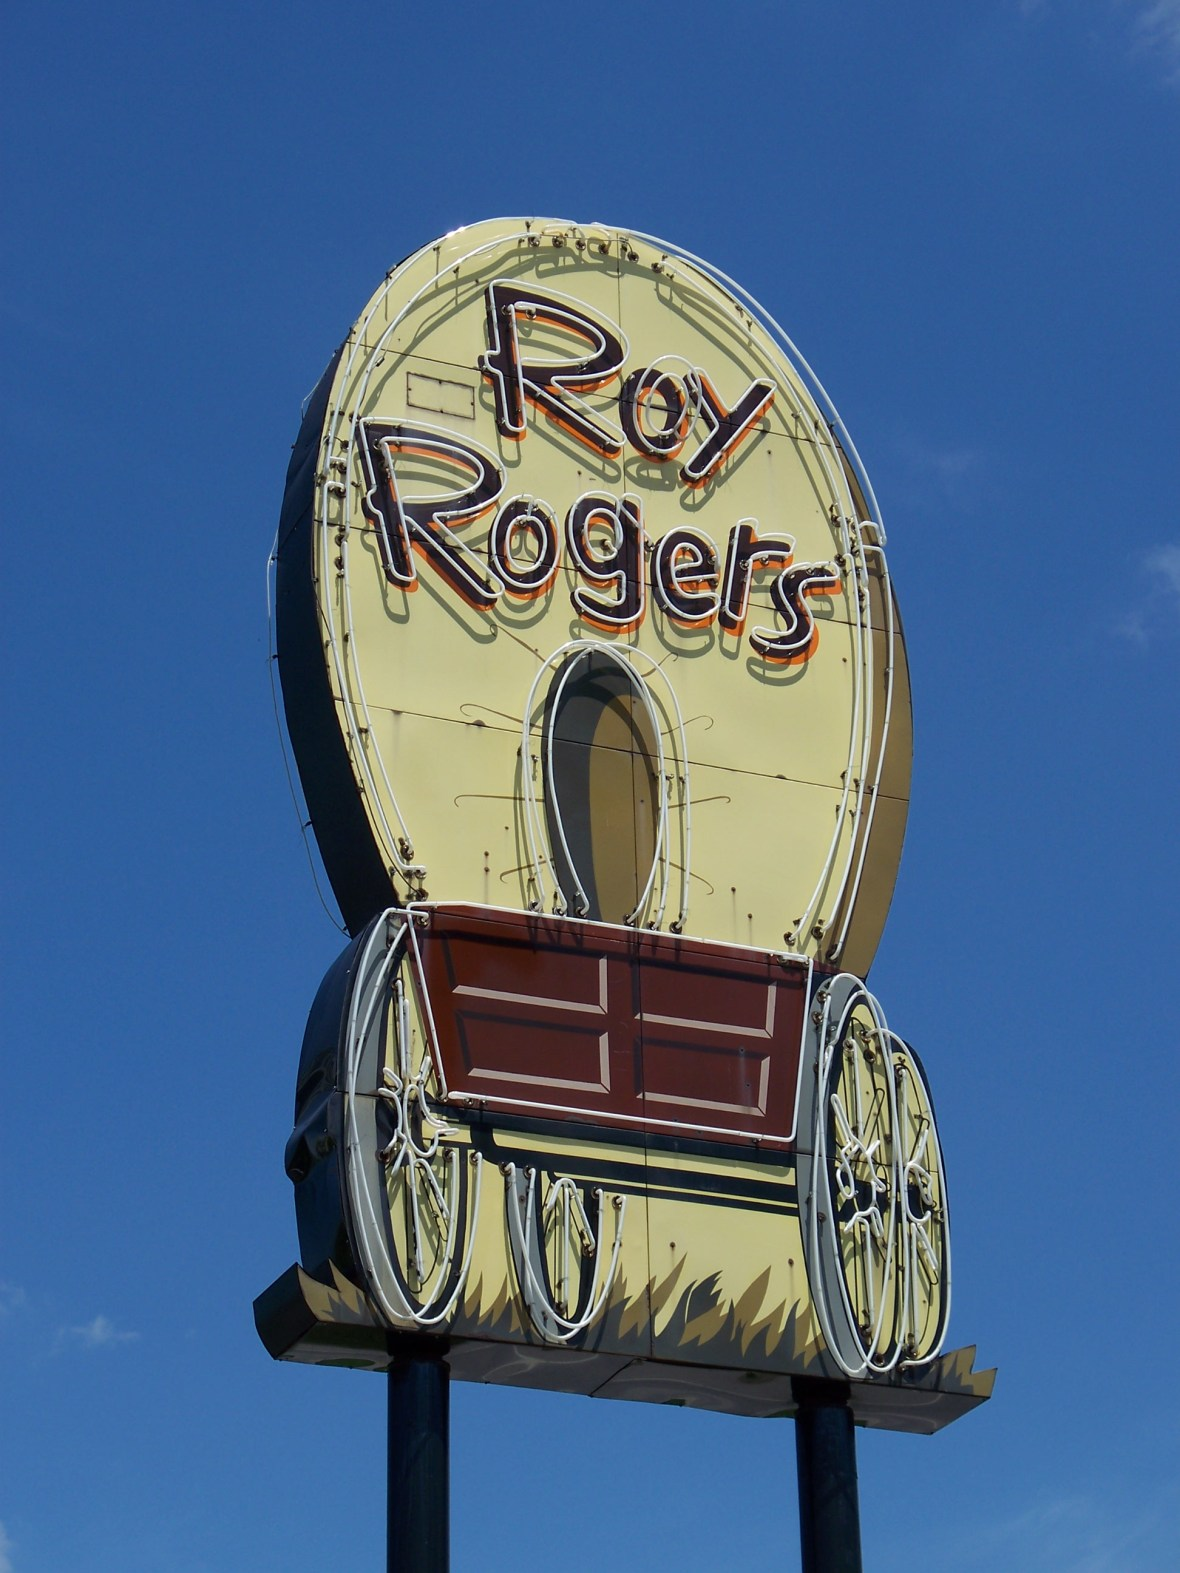 Roy Rogers - 474 Roney Lane, Cincinnati, Ohio, U.S.A. - May 10, 2008